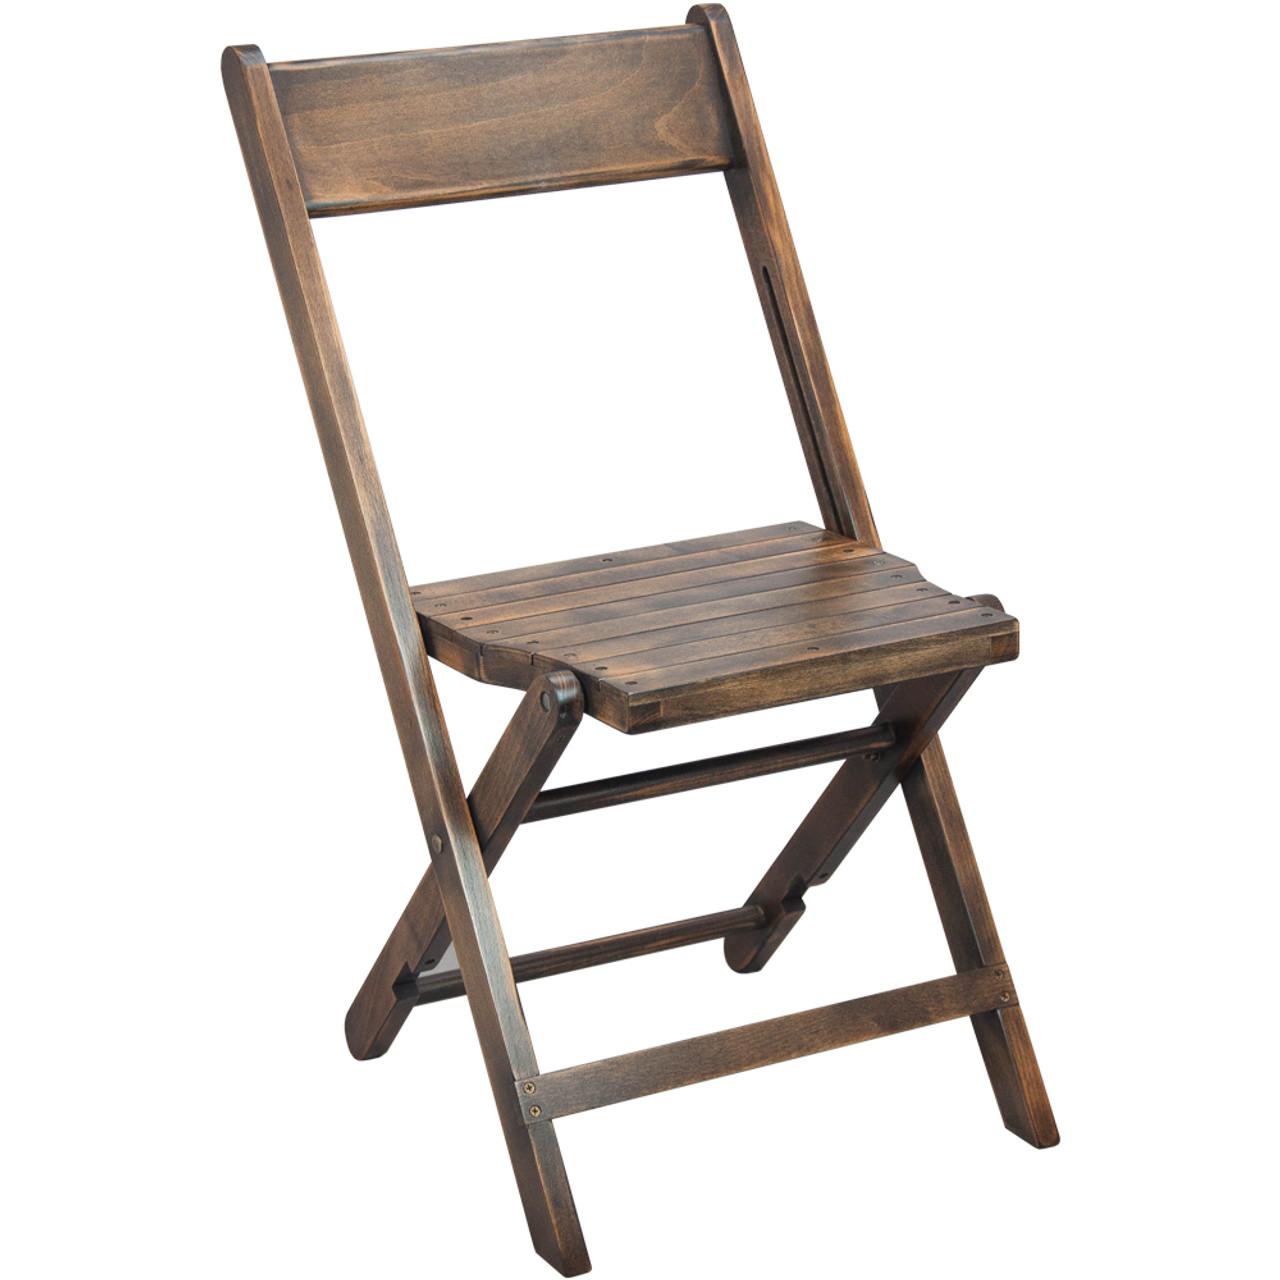 Advantage Slatted Wood Folding Wedding Chair - Antique Black [WFC-SLAT-AB] - Antique Black Wood Folding Wedding Chair Slatted Wedding Chairs